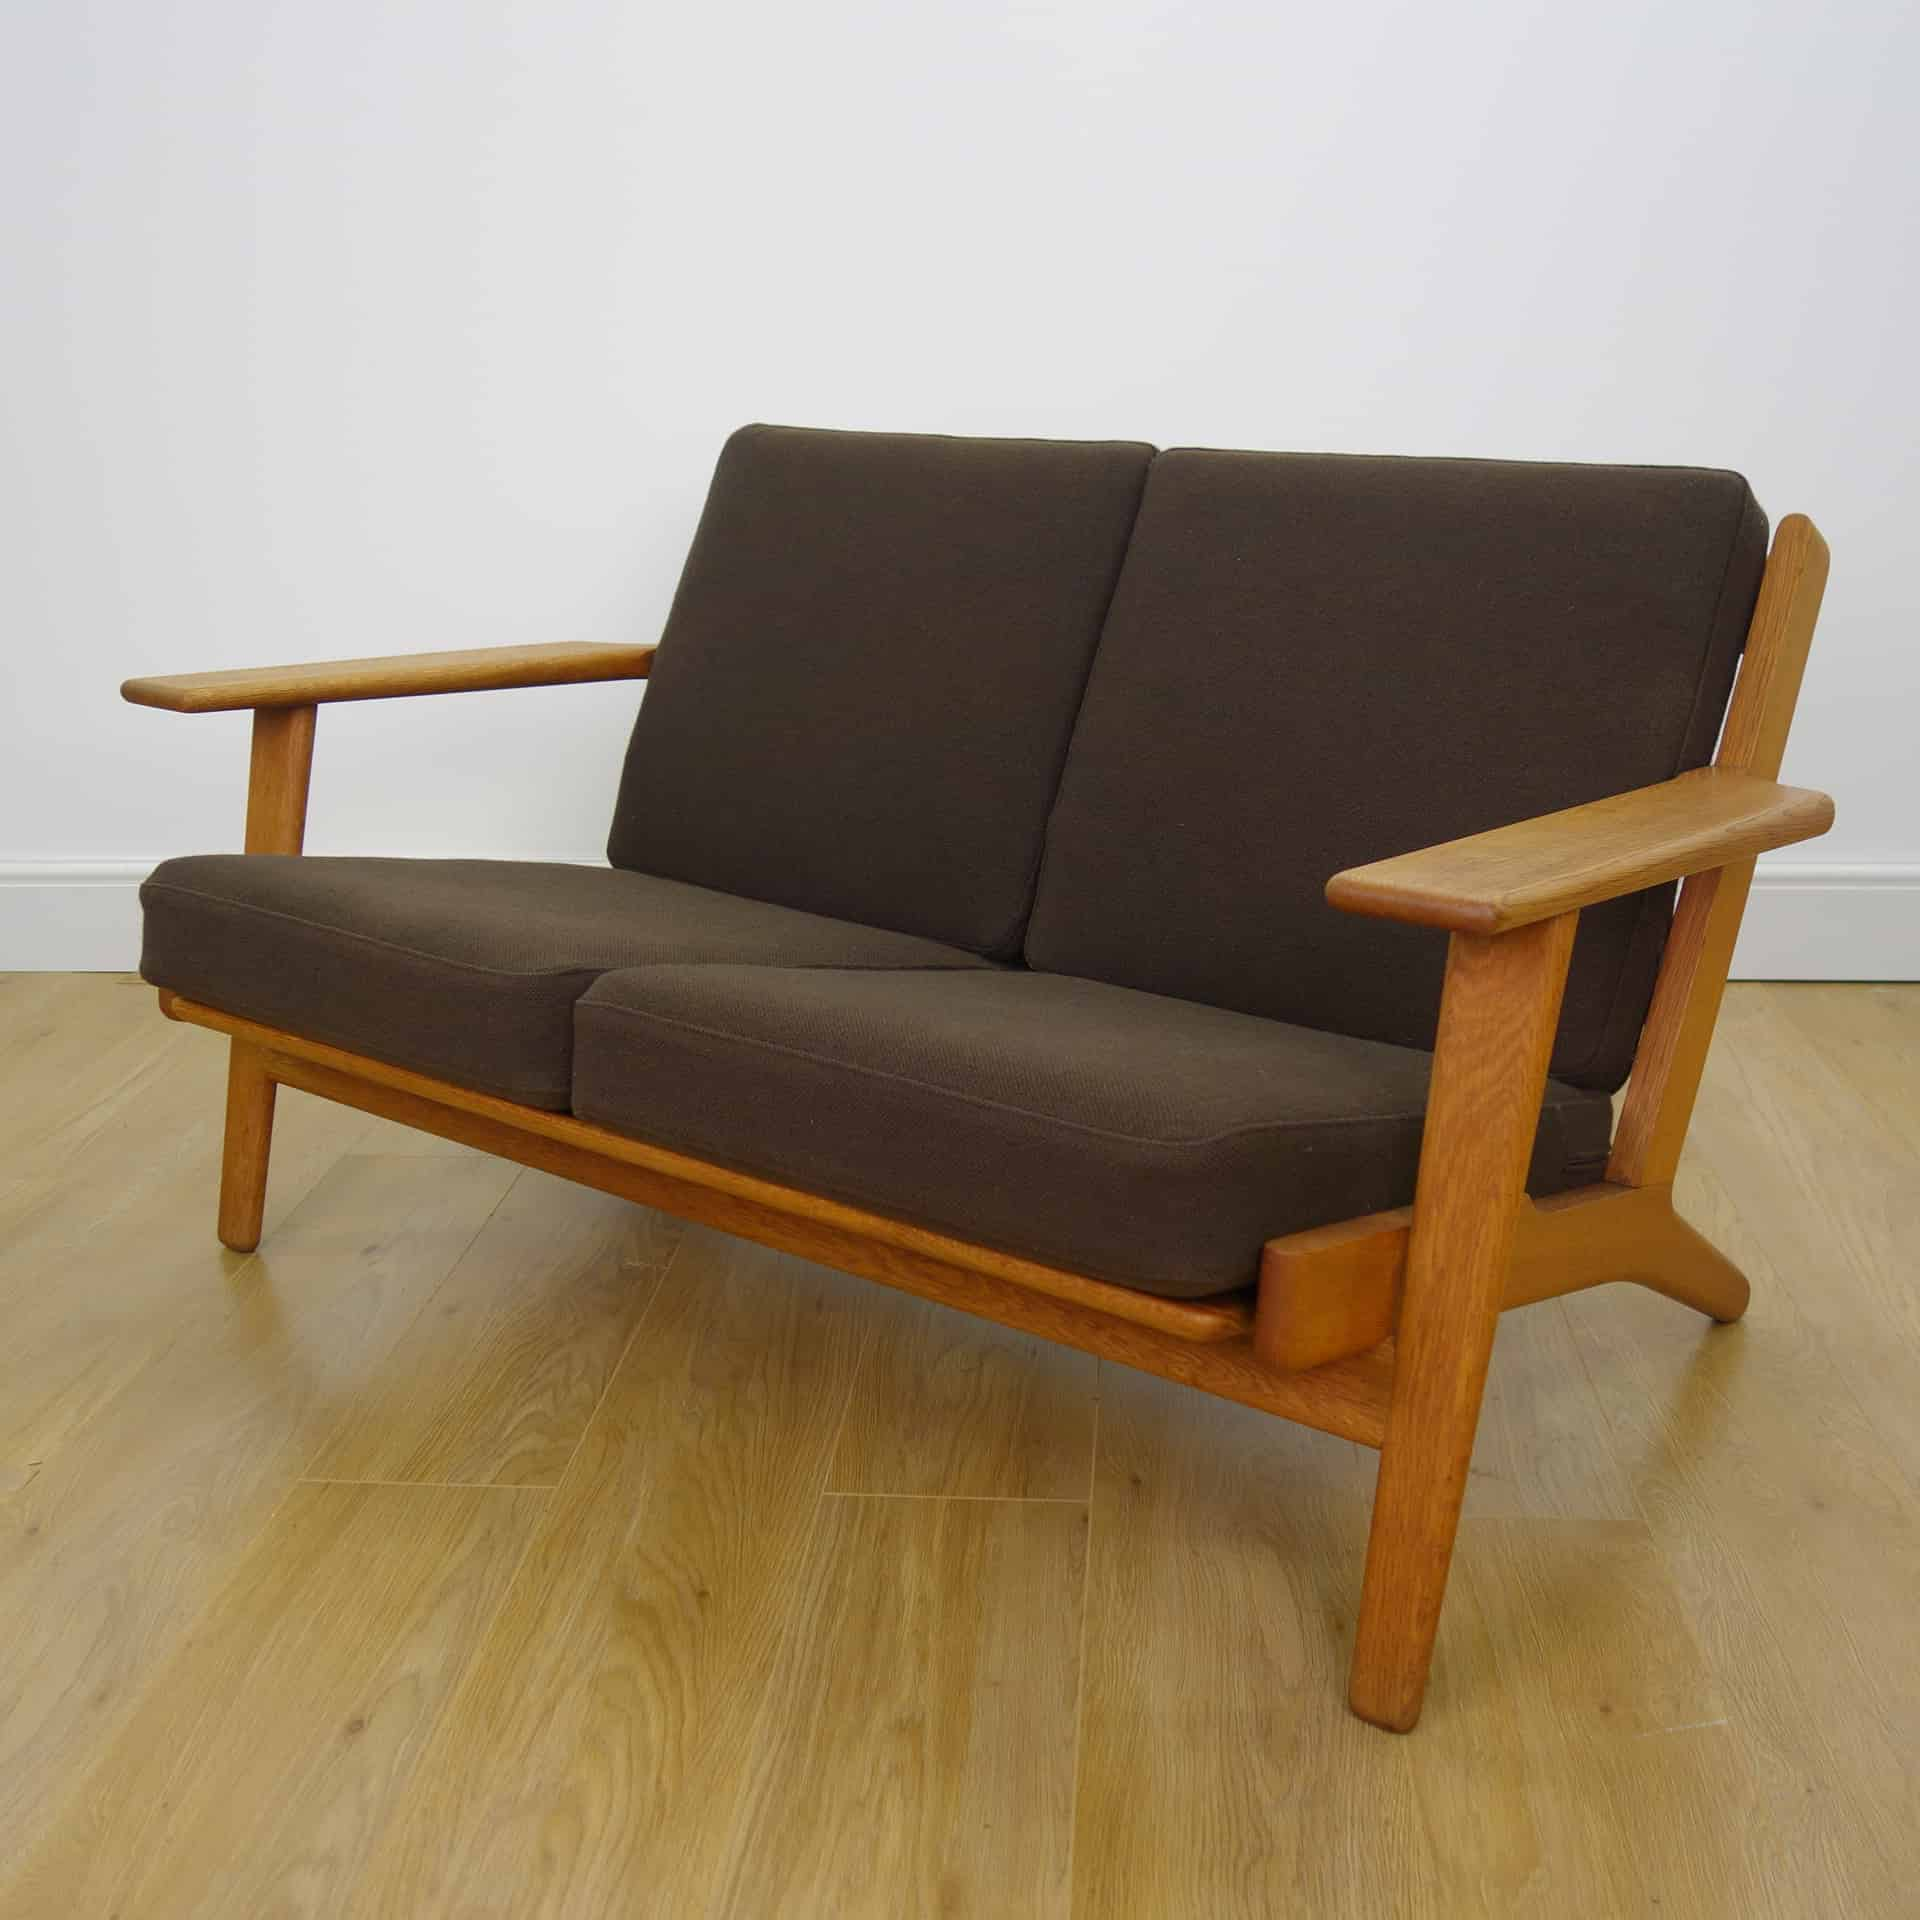 1960s 2 seat plank sofa by hans wegner mark parrish mid century modern